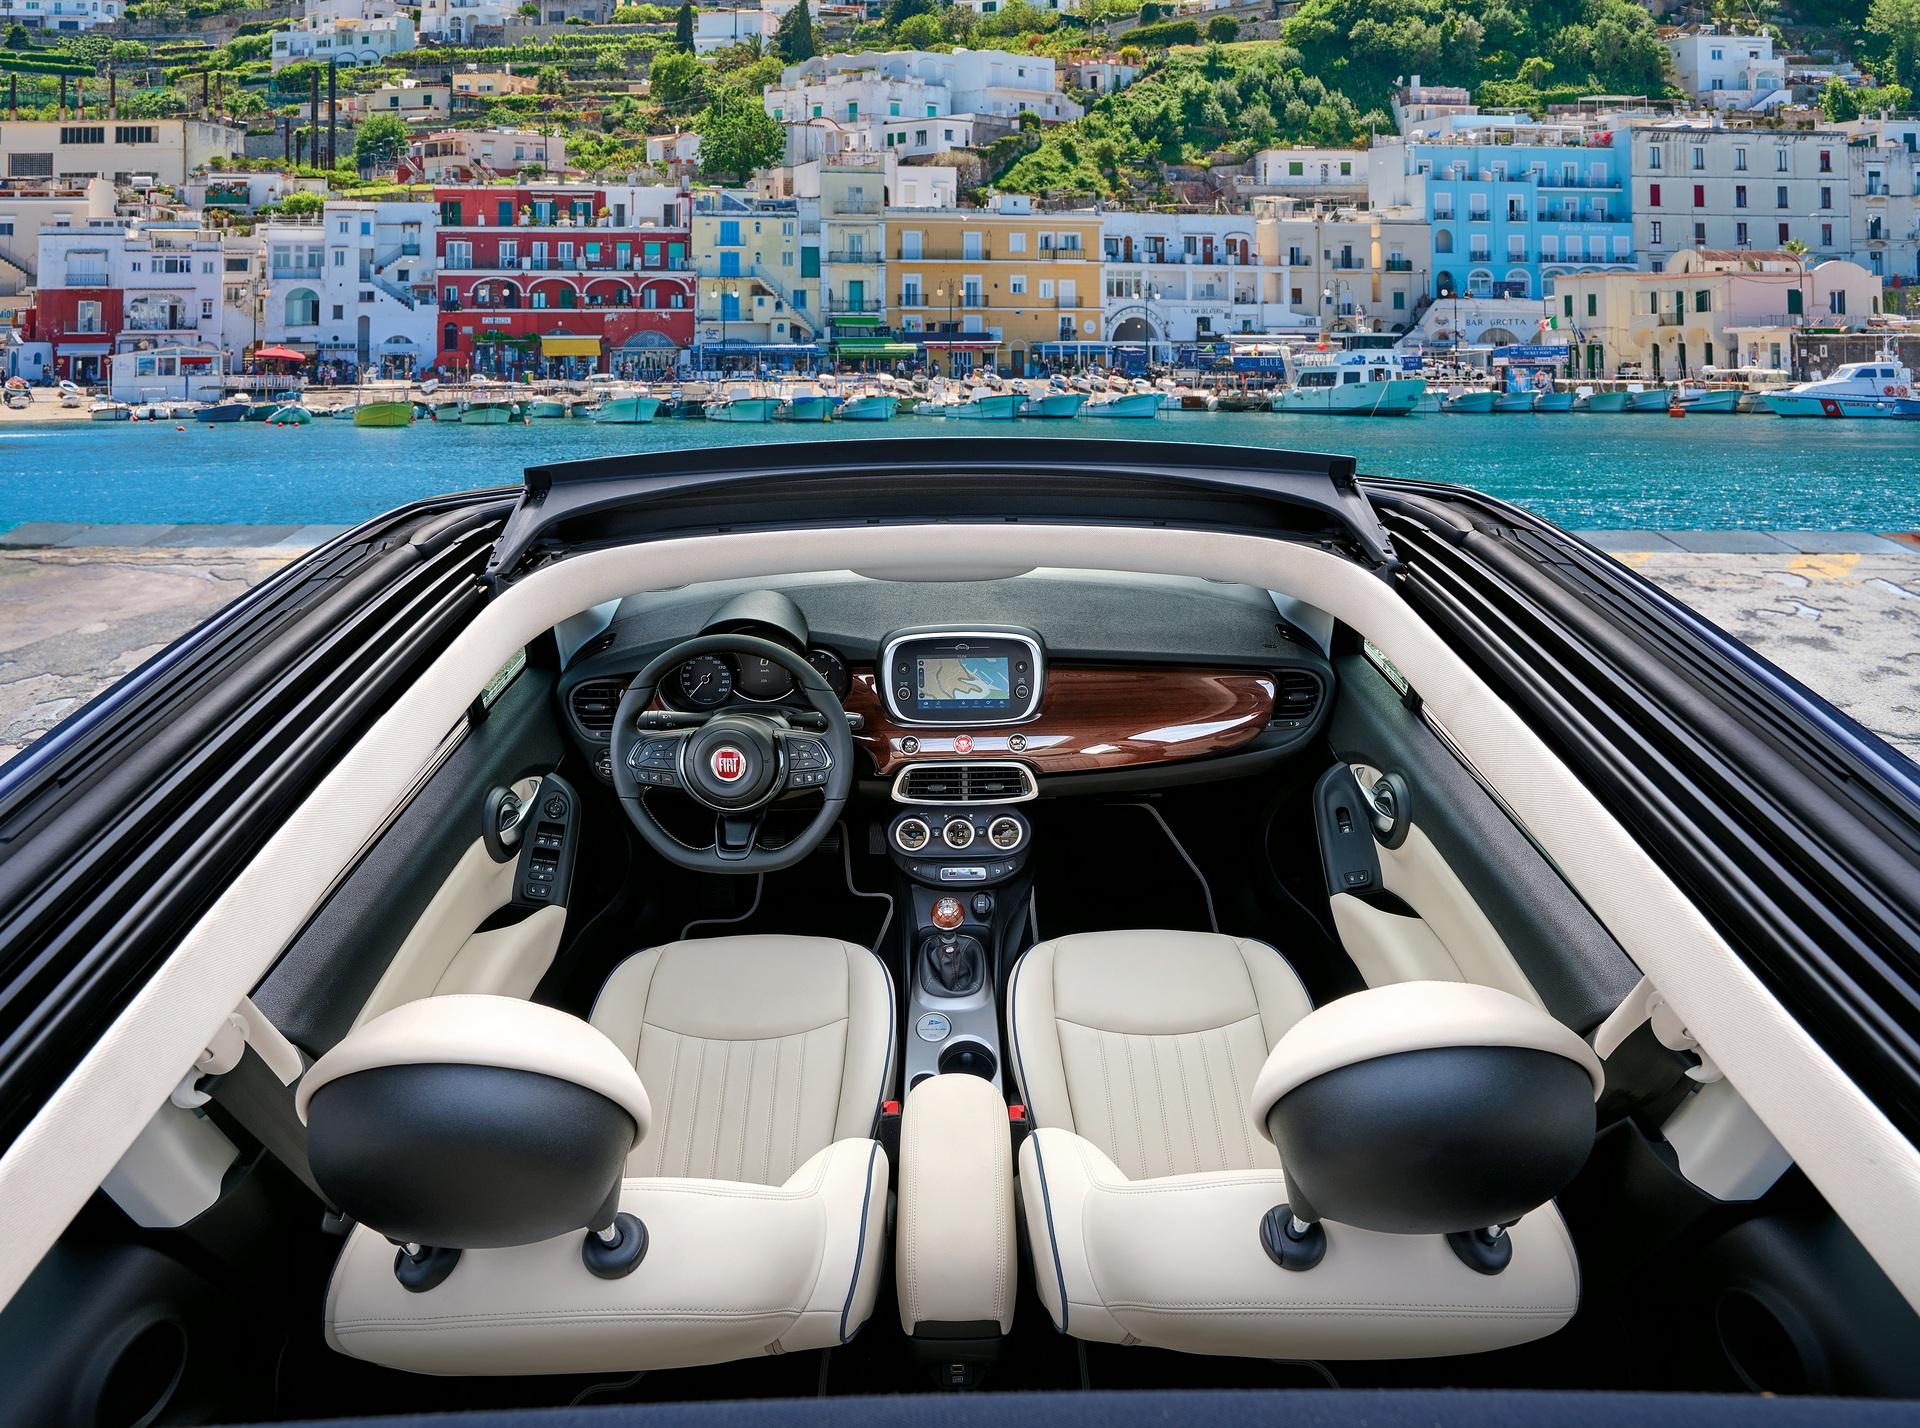 Fiat 500X Yatching